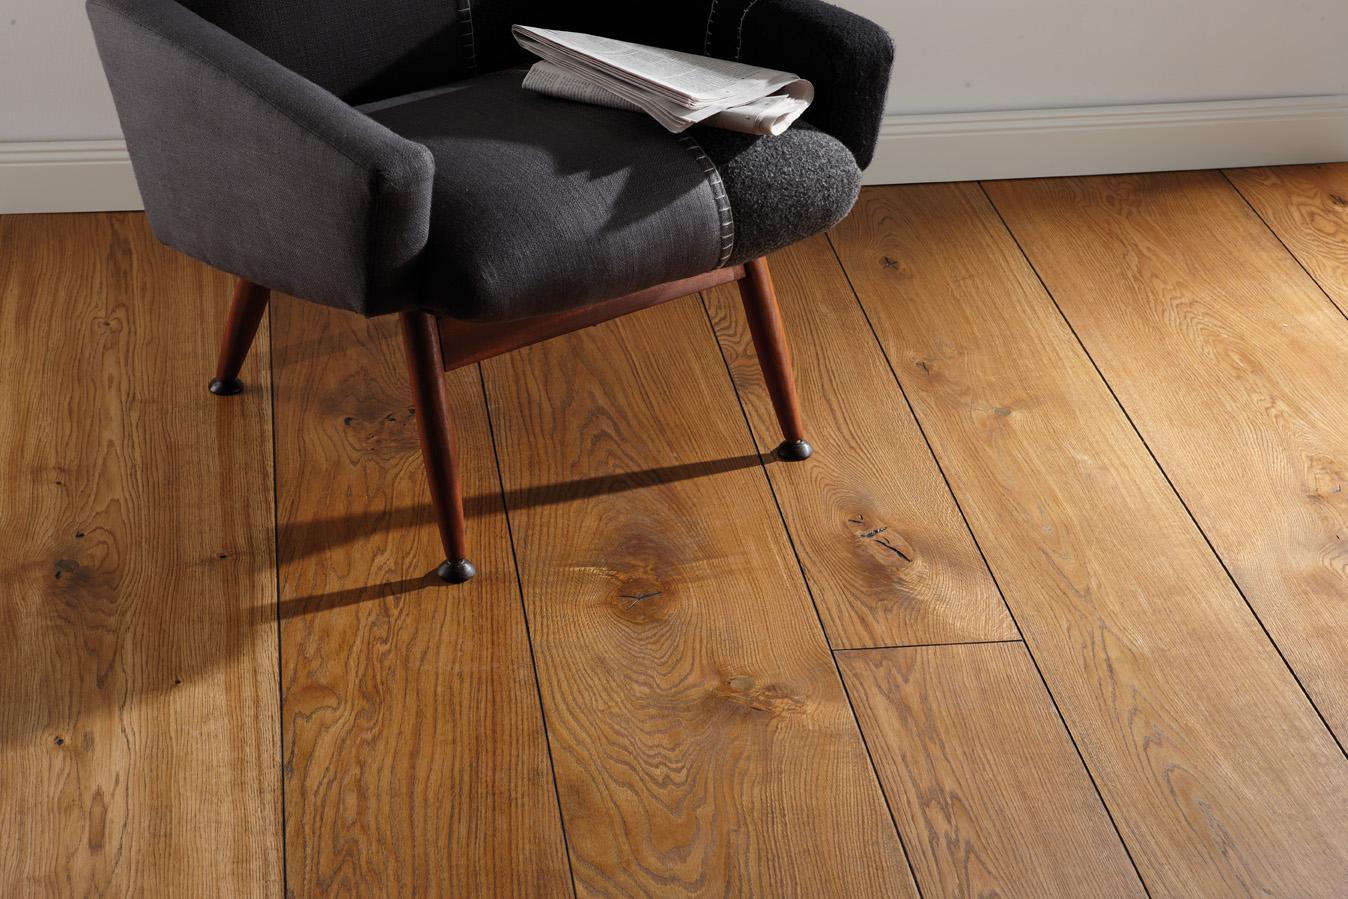 Tipos de parquet de madera timberplan - Parquet de madera natural ...